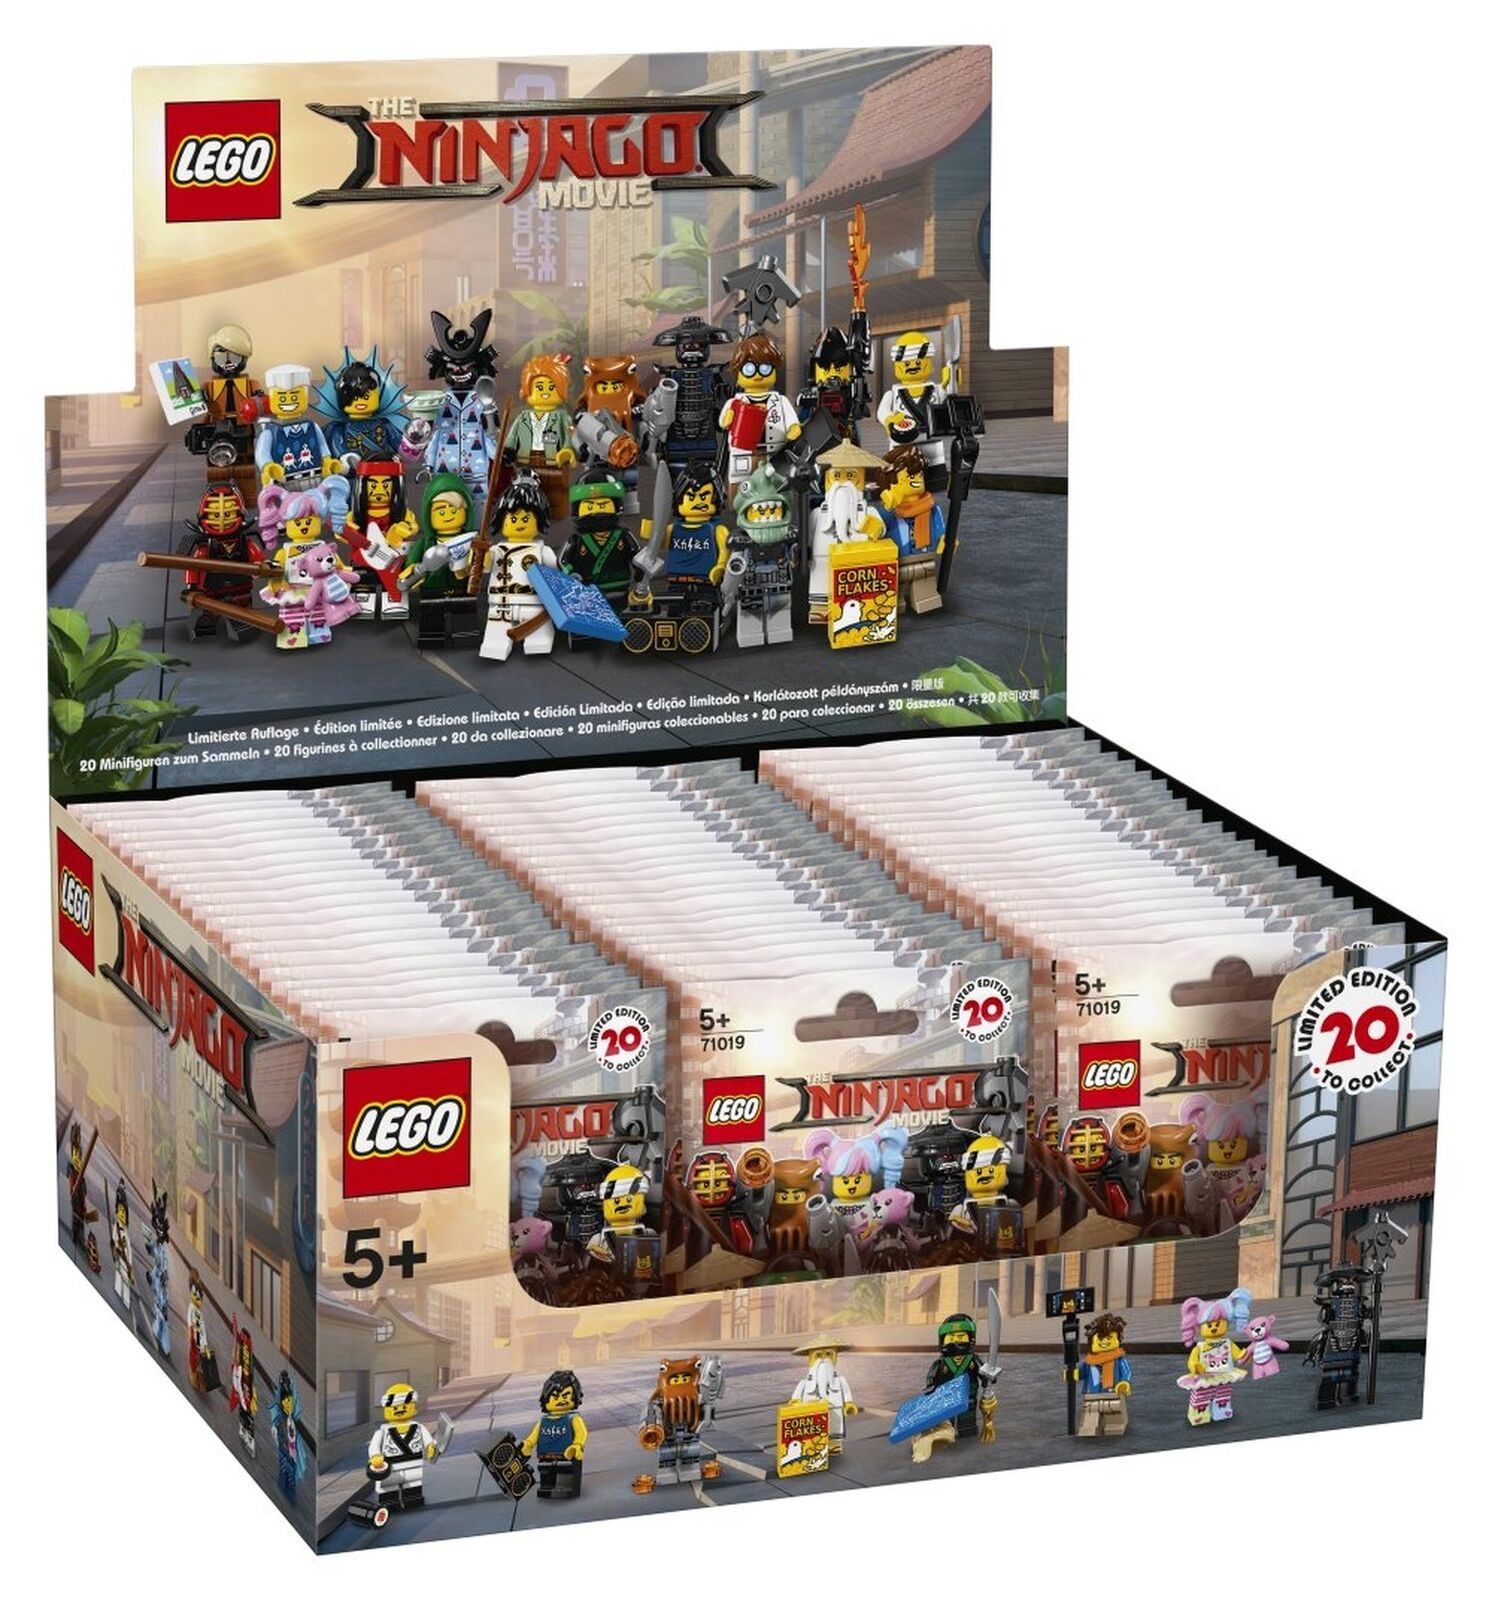 Full box of of of 60 Sealed packs 71019 The Lego Ninjago Movie Minifigures 2017 NEW d50c72